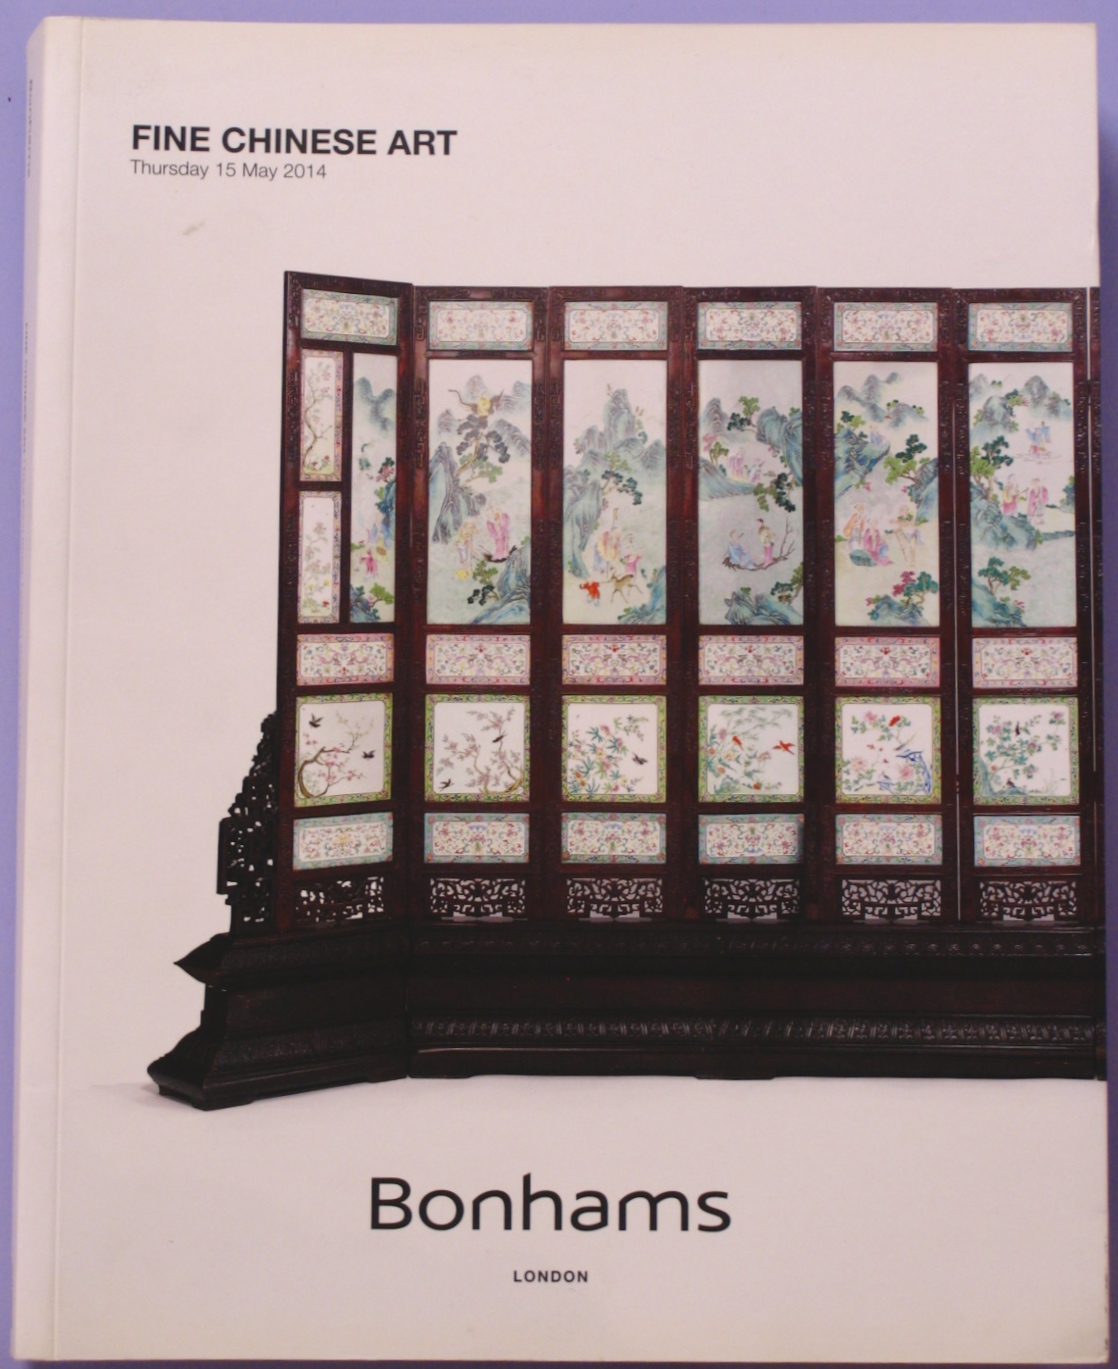 BL20140516B: Bookshop: [2014] Bonhams London Fine Chinese Art (second copy)